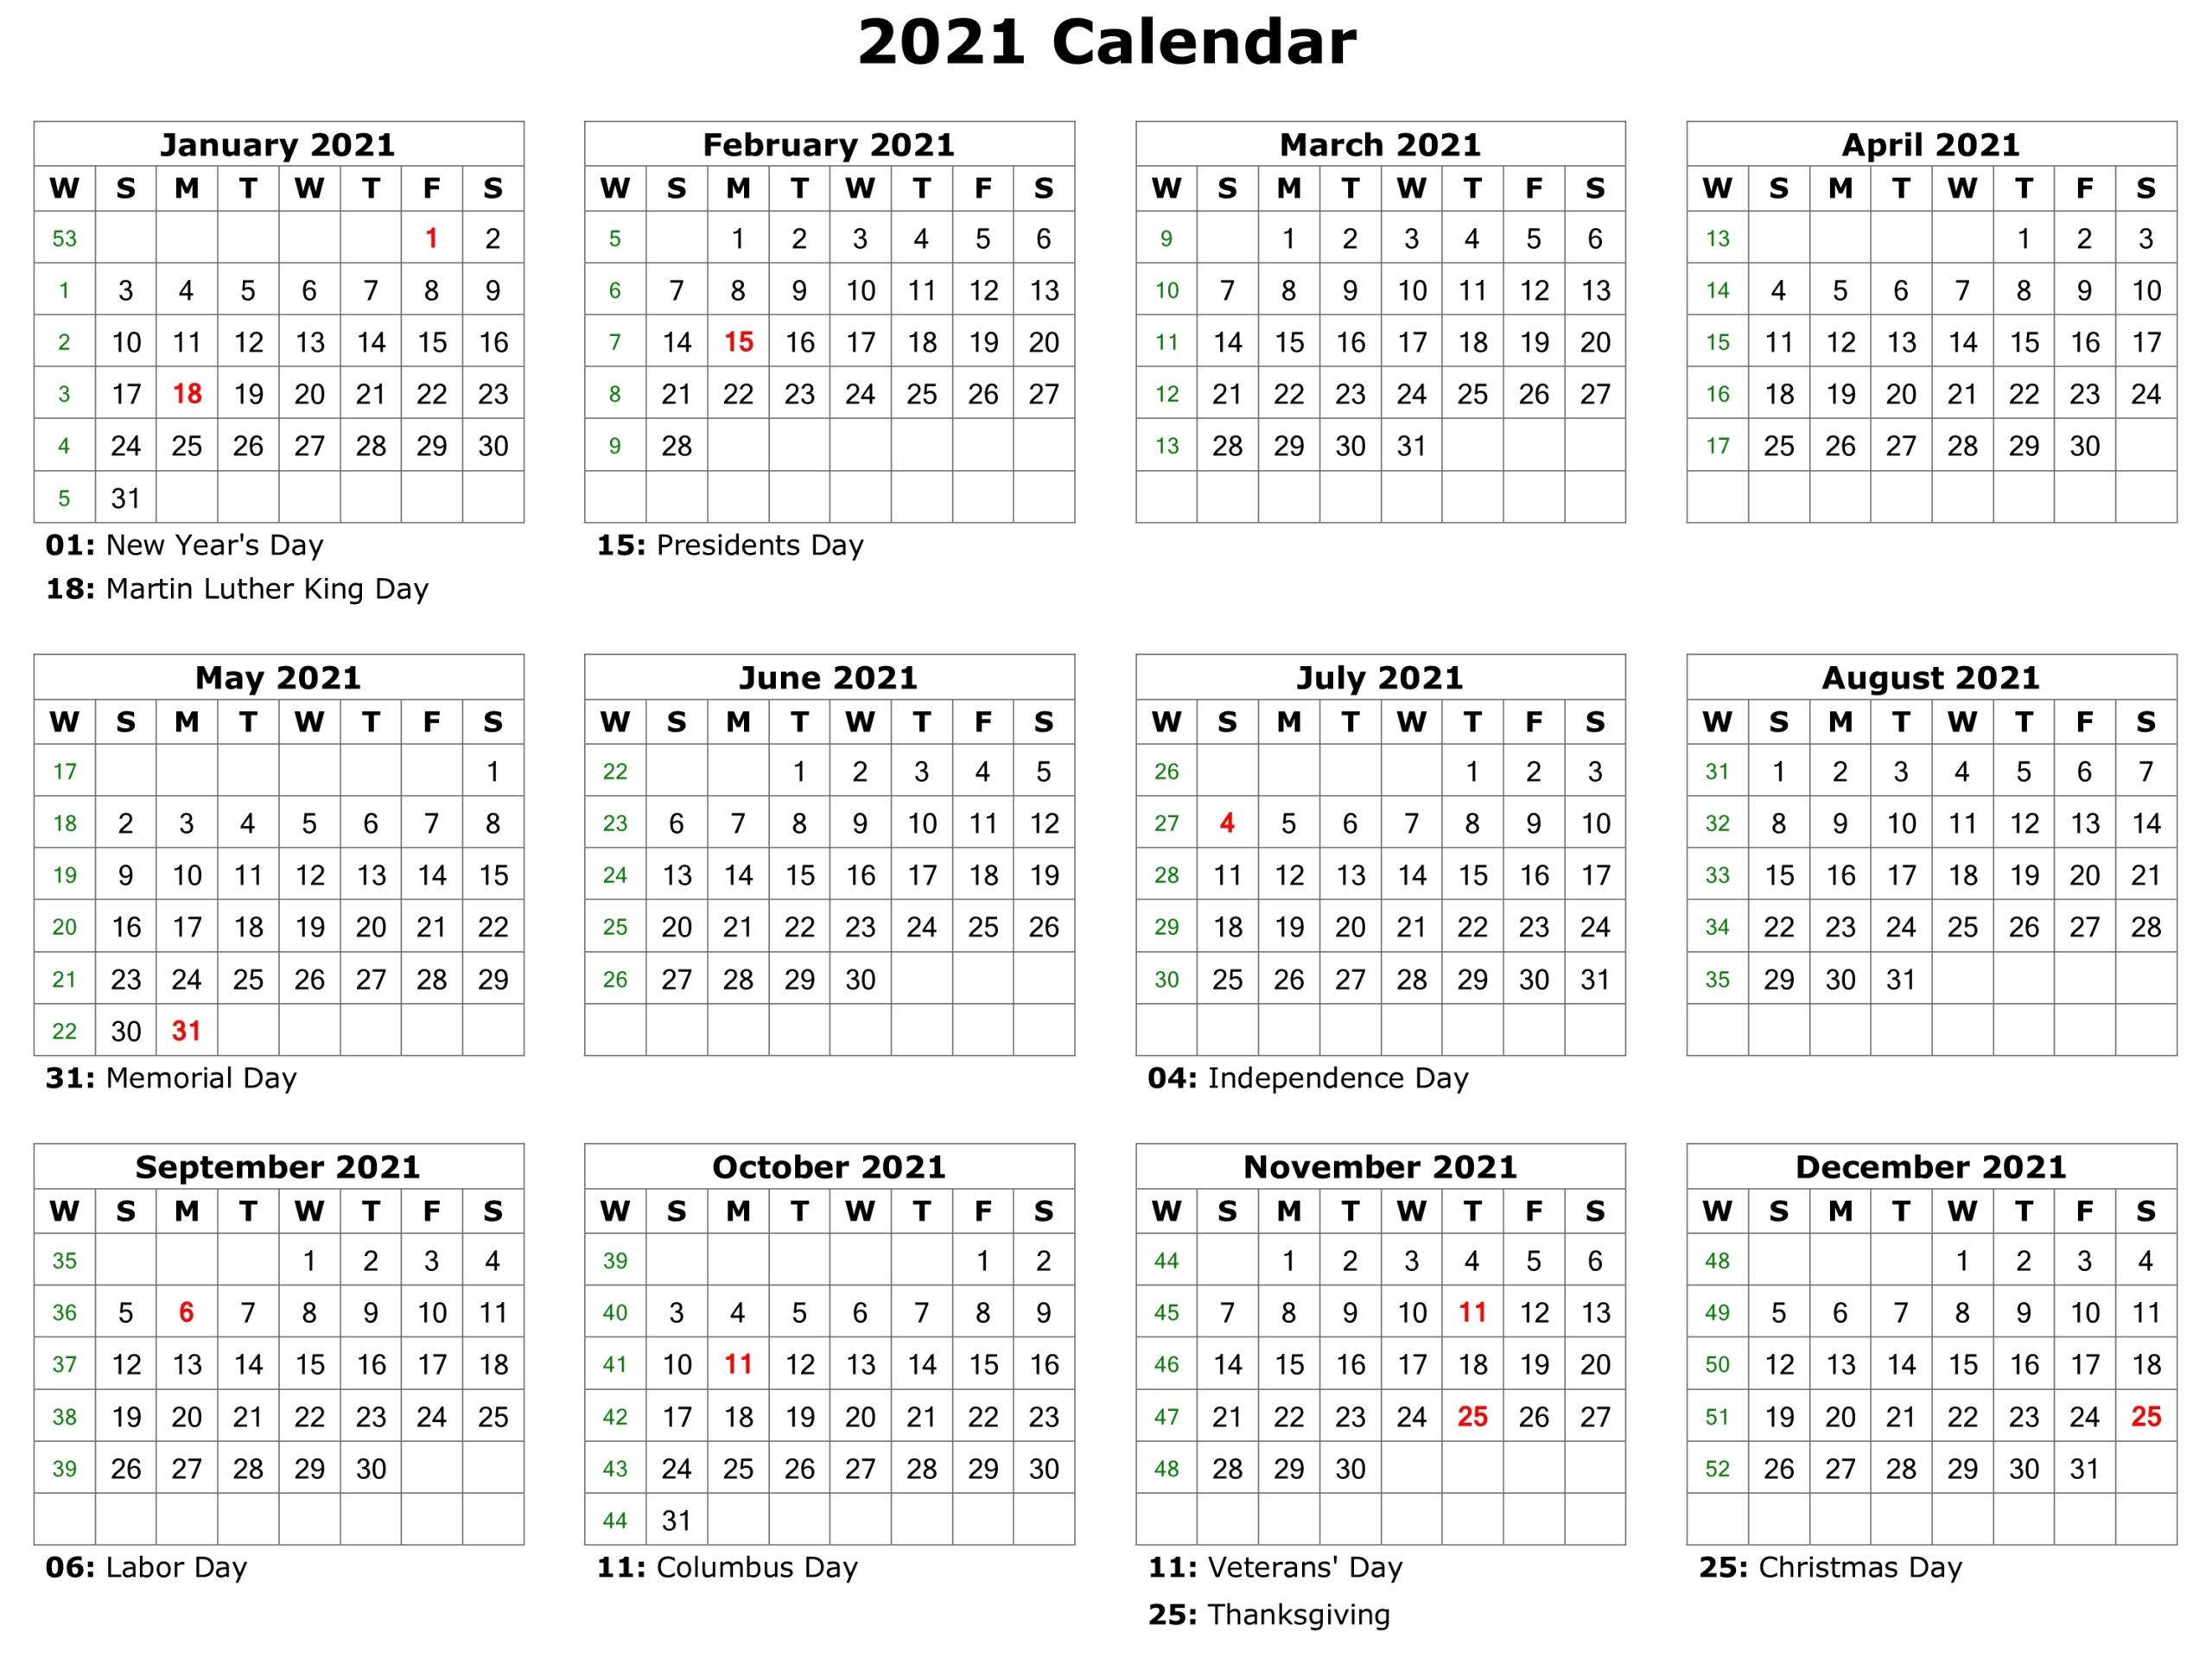 Free Printeable Pocket Calendar For 2021 | Calendar ...